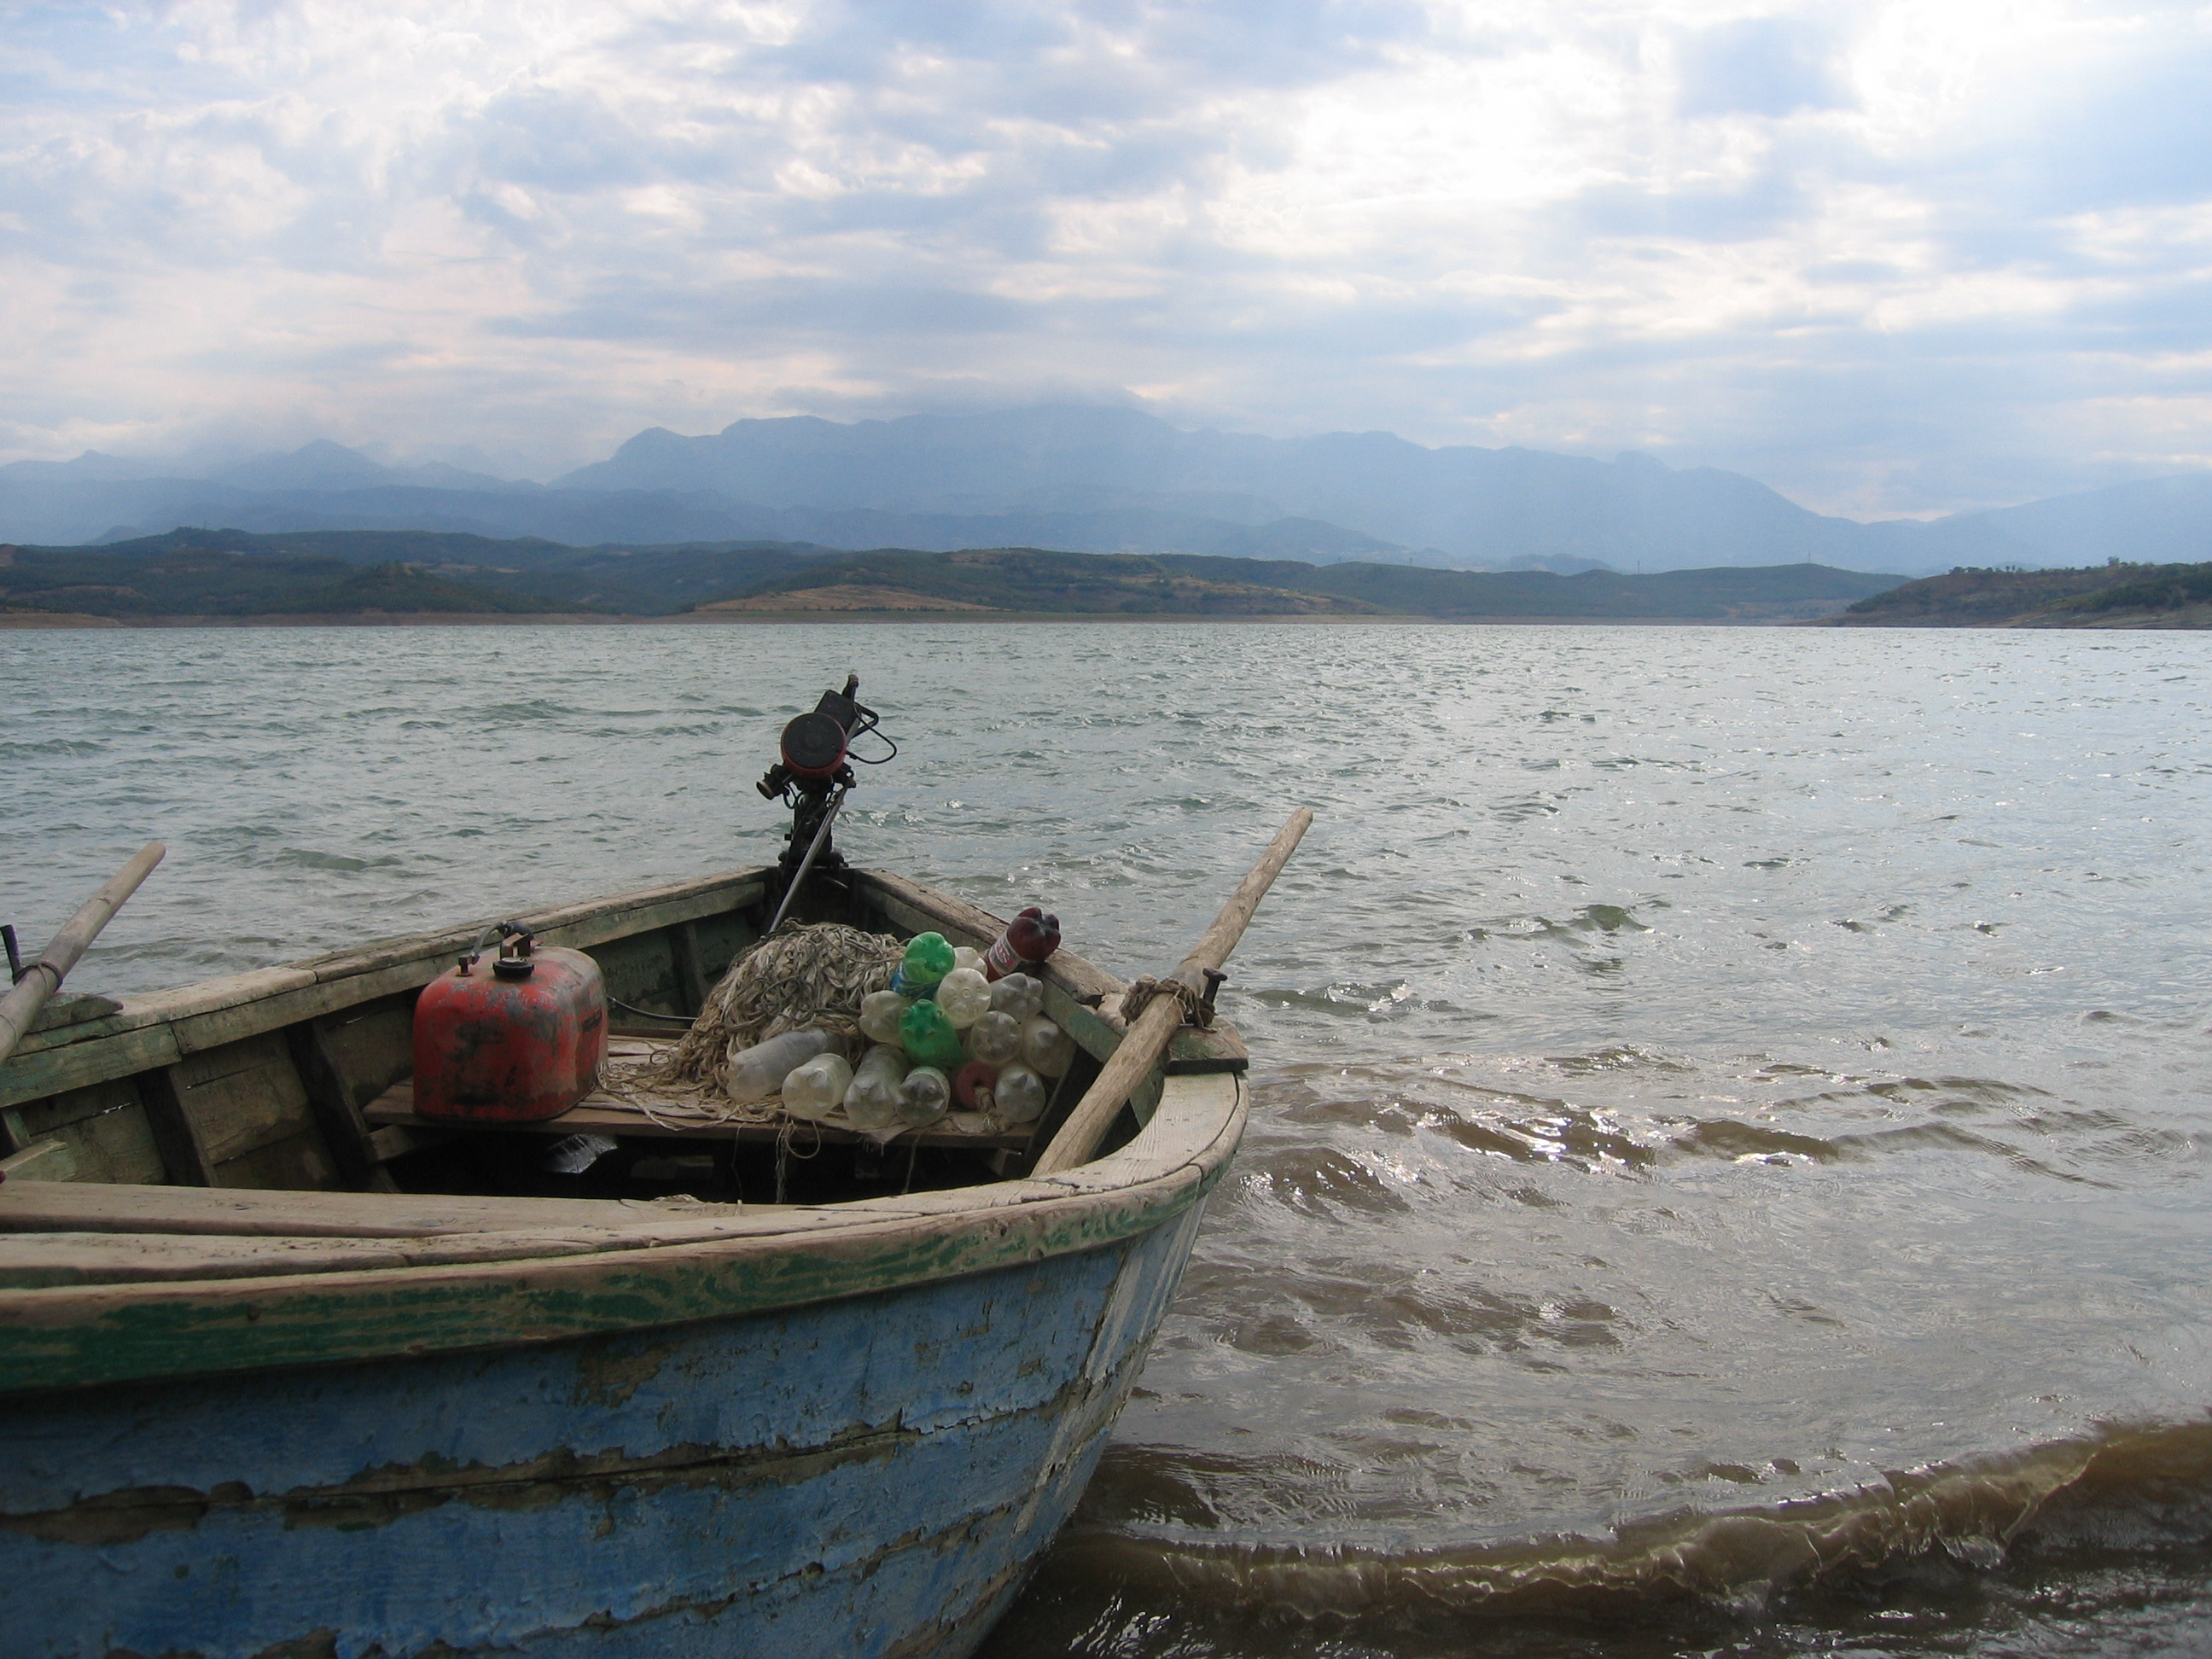 Albanian Fisherman's Boat